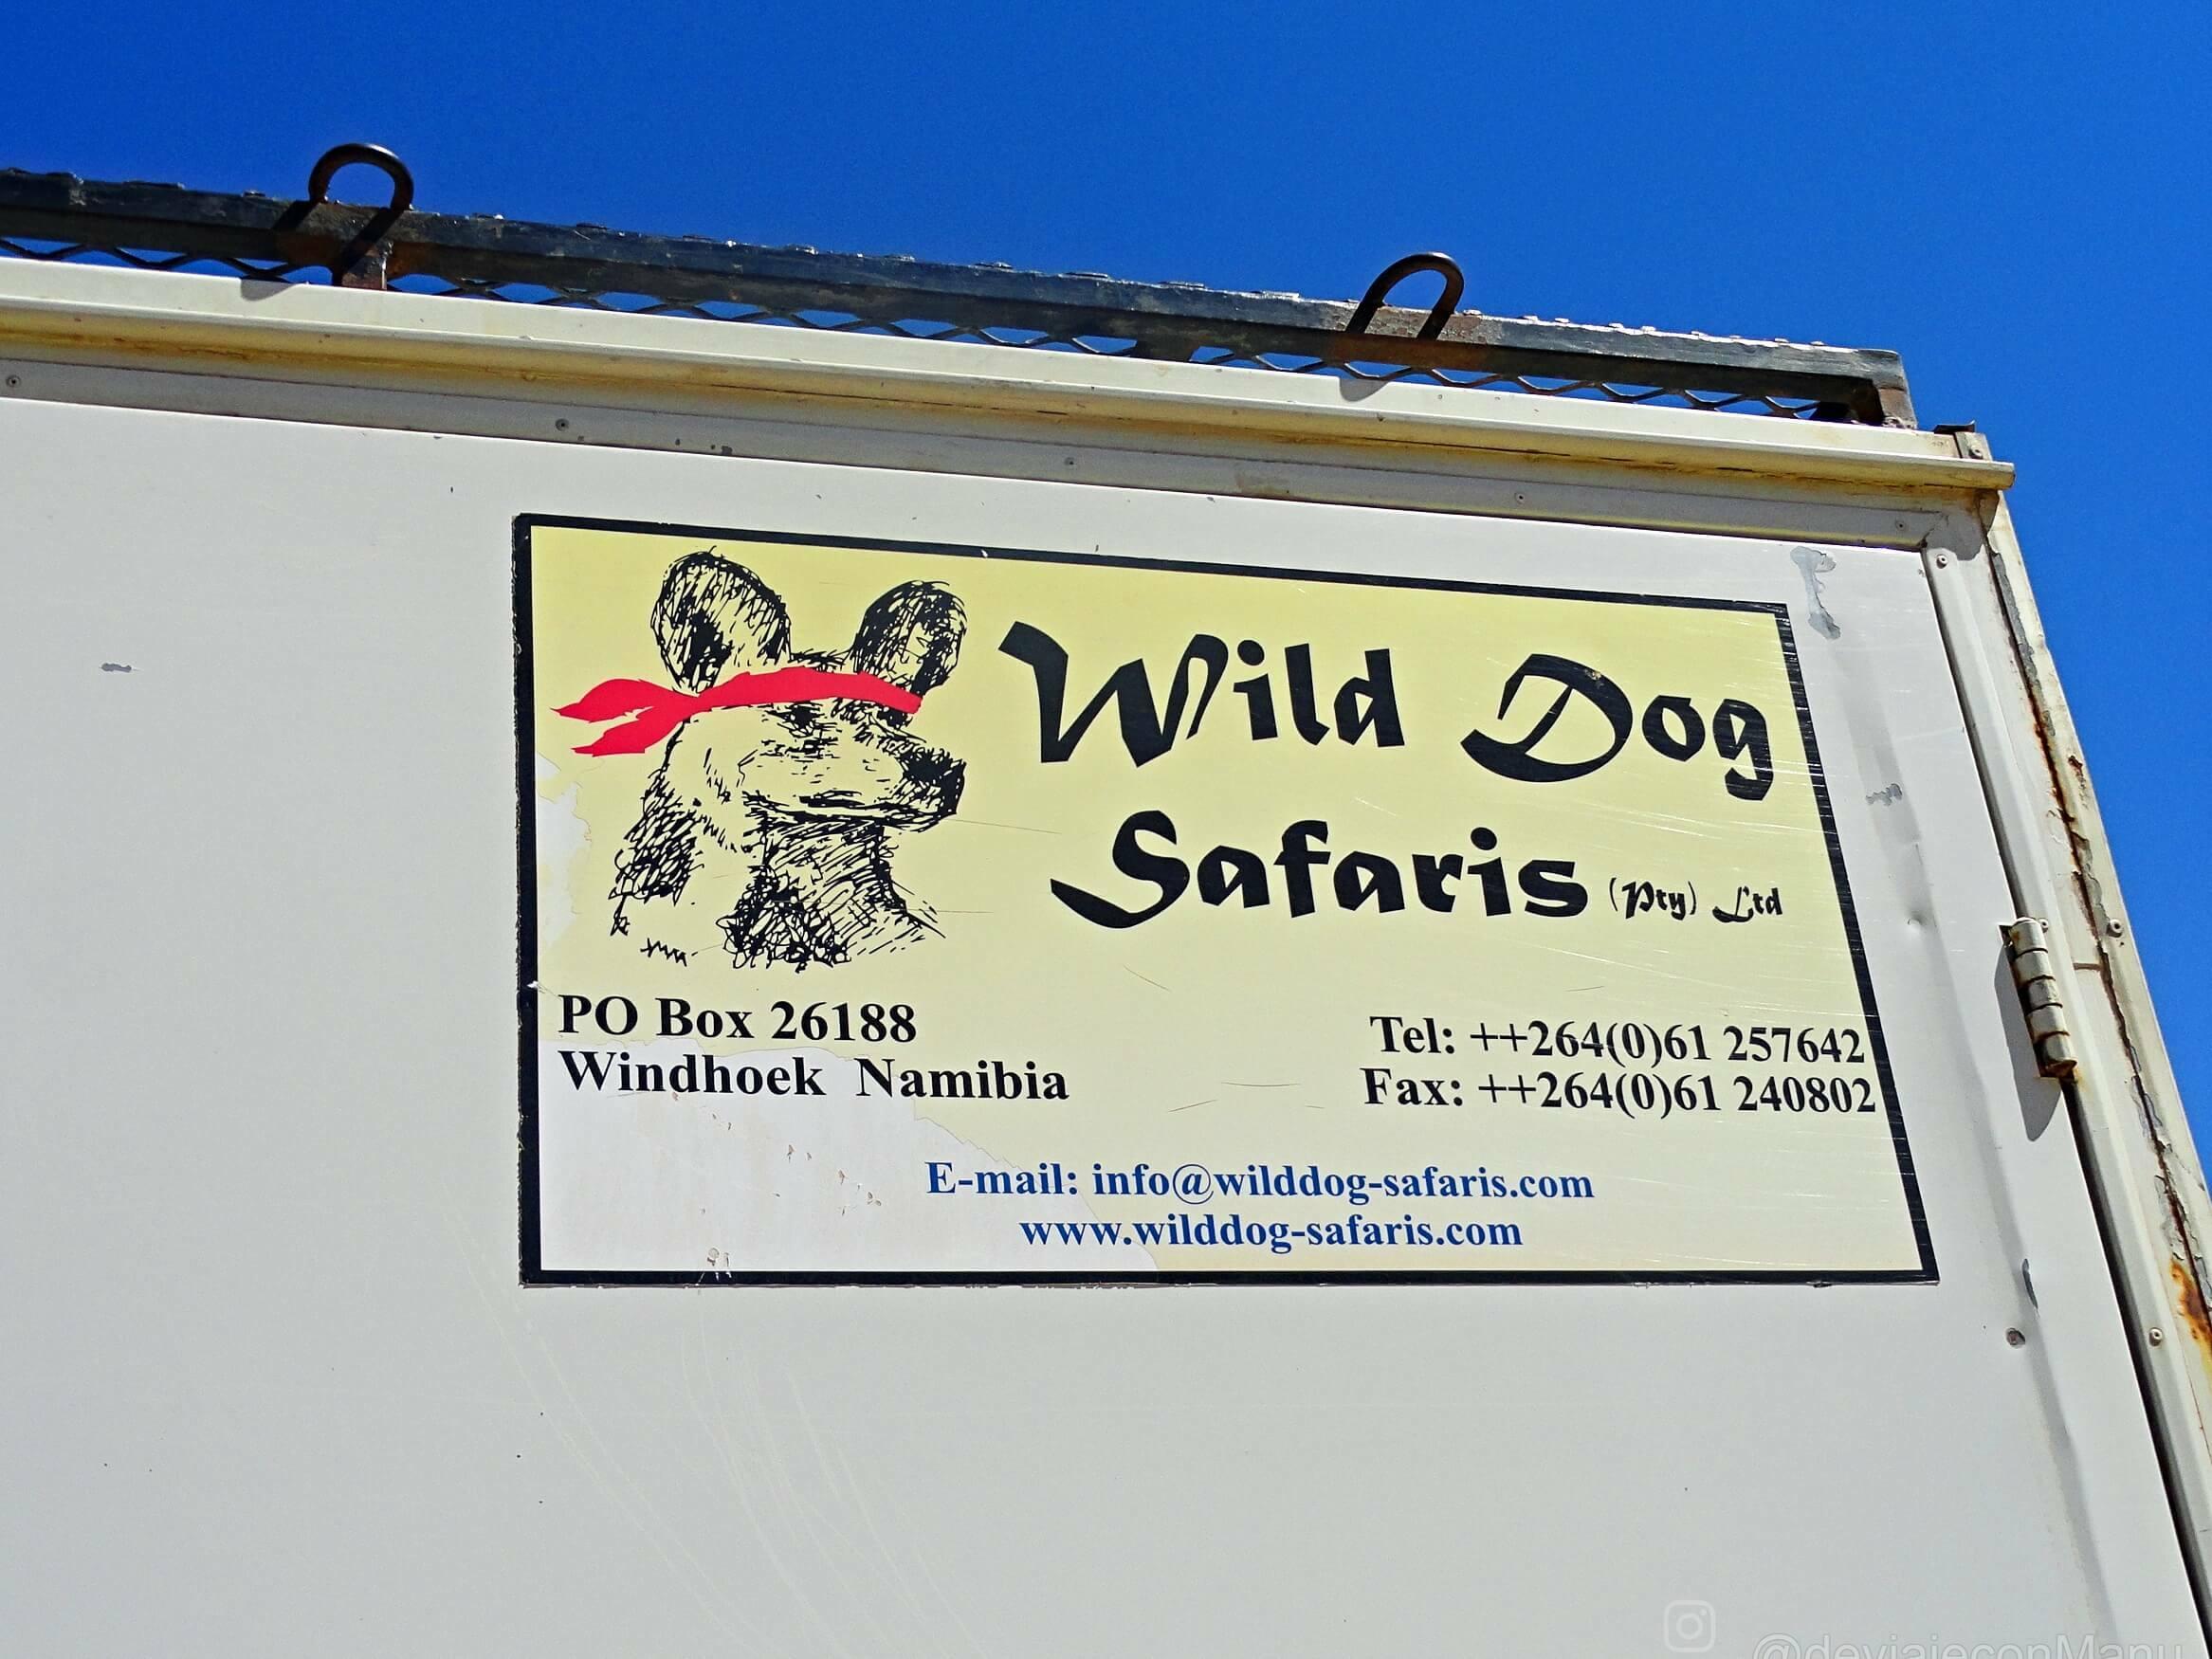 Wild dog safaris